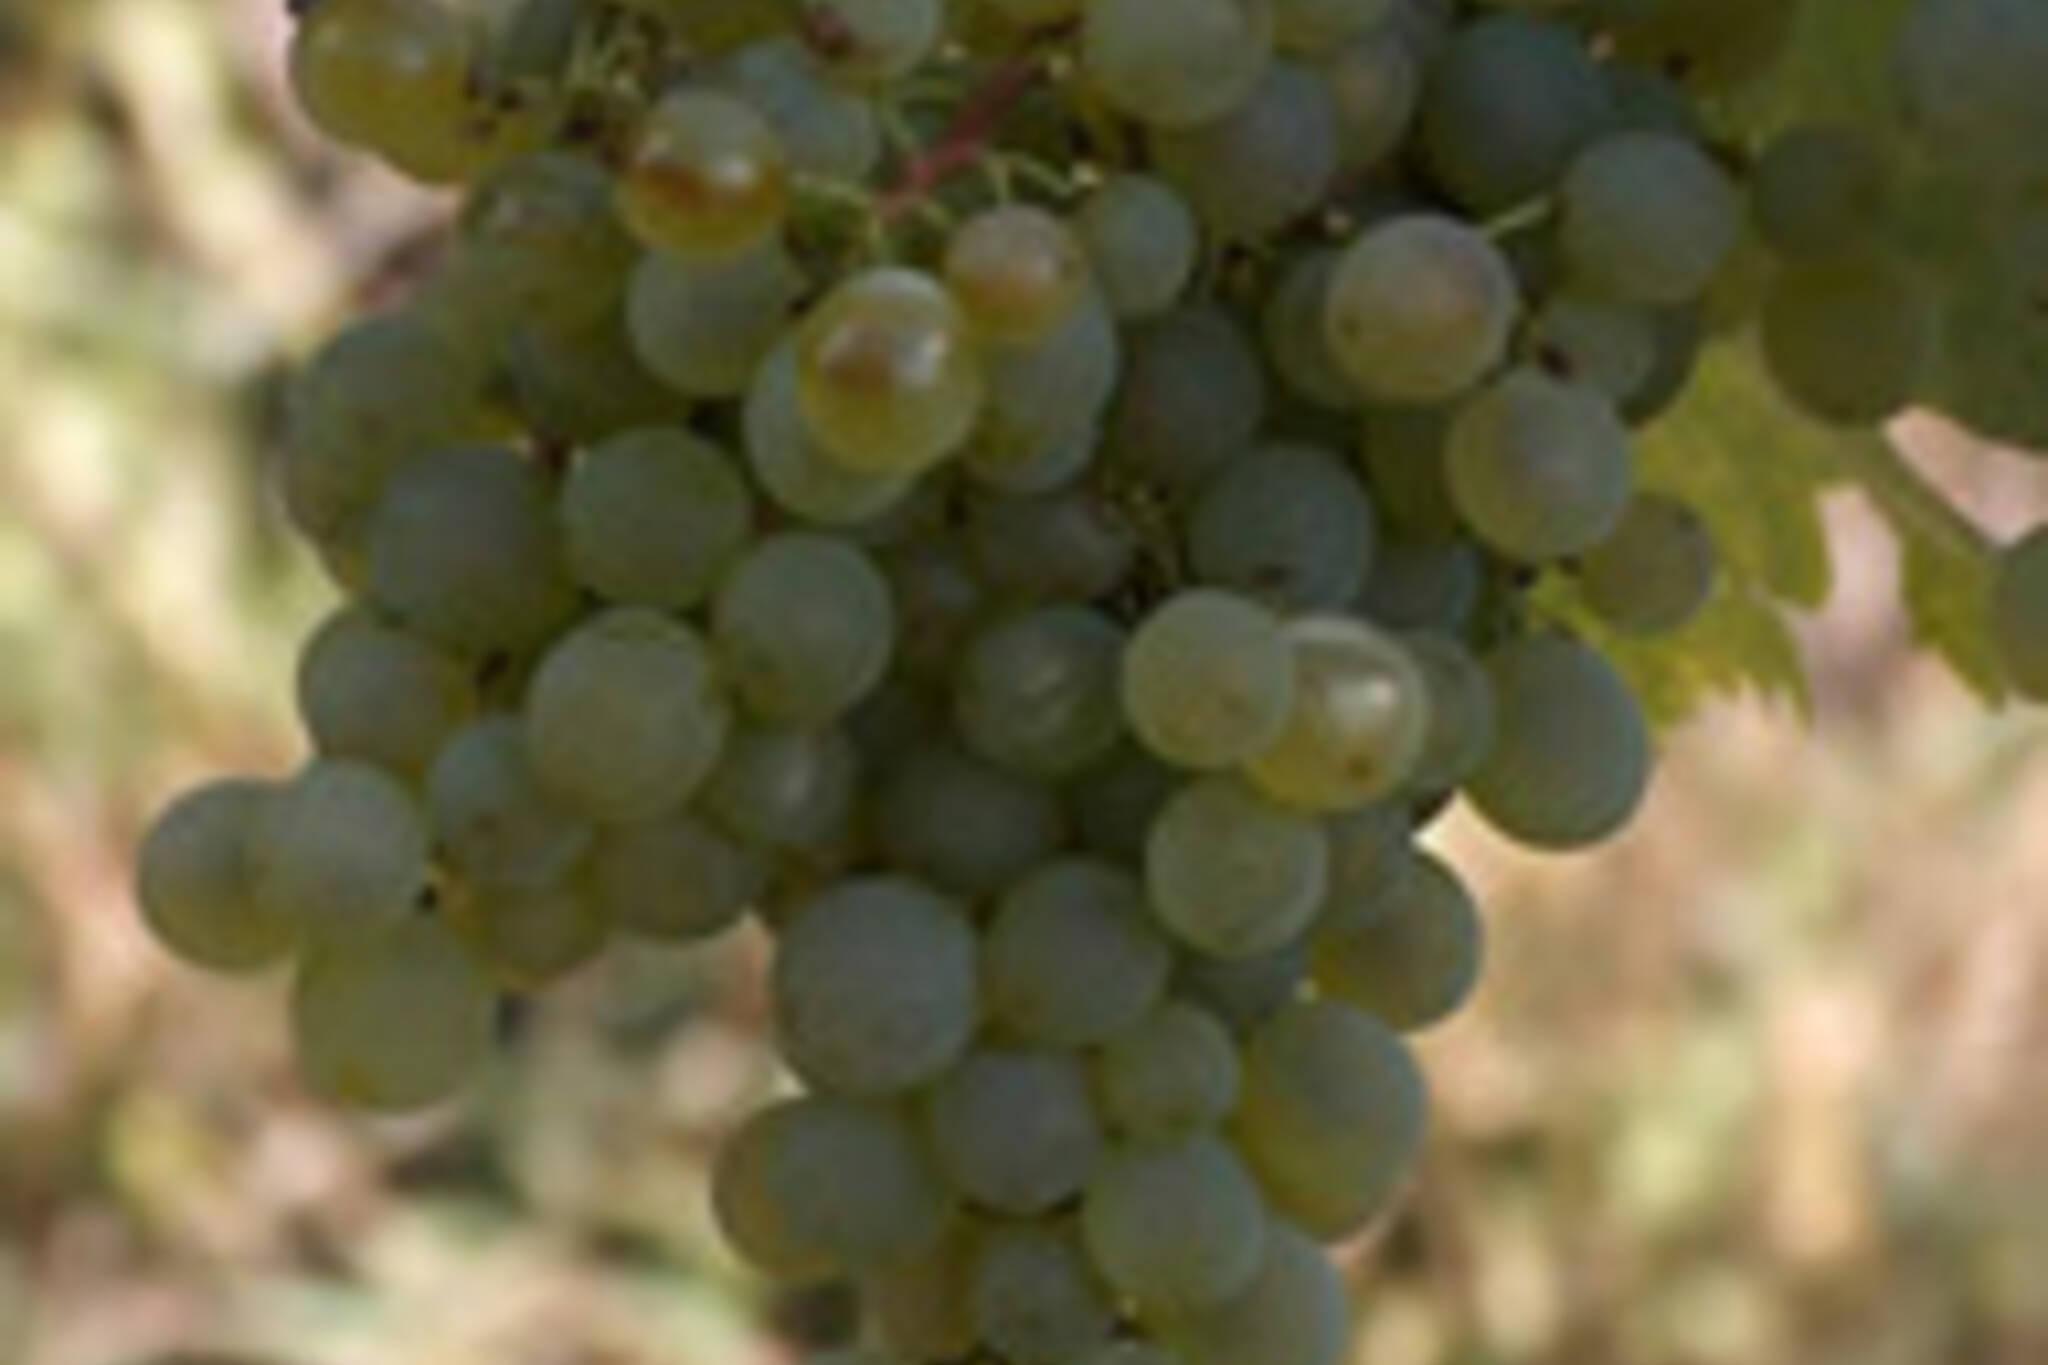 Gruner Veltliner nearly ready for harvest in Austria (image courtesy of www.wineanorak.com)